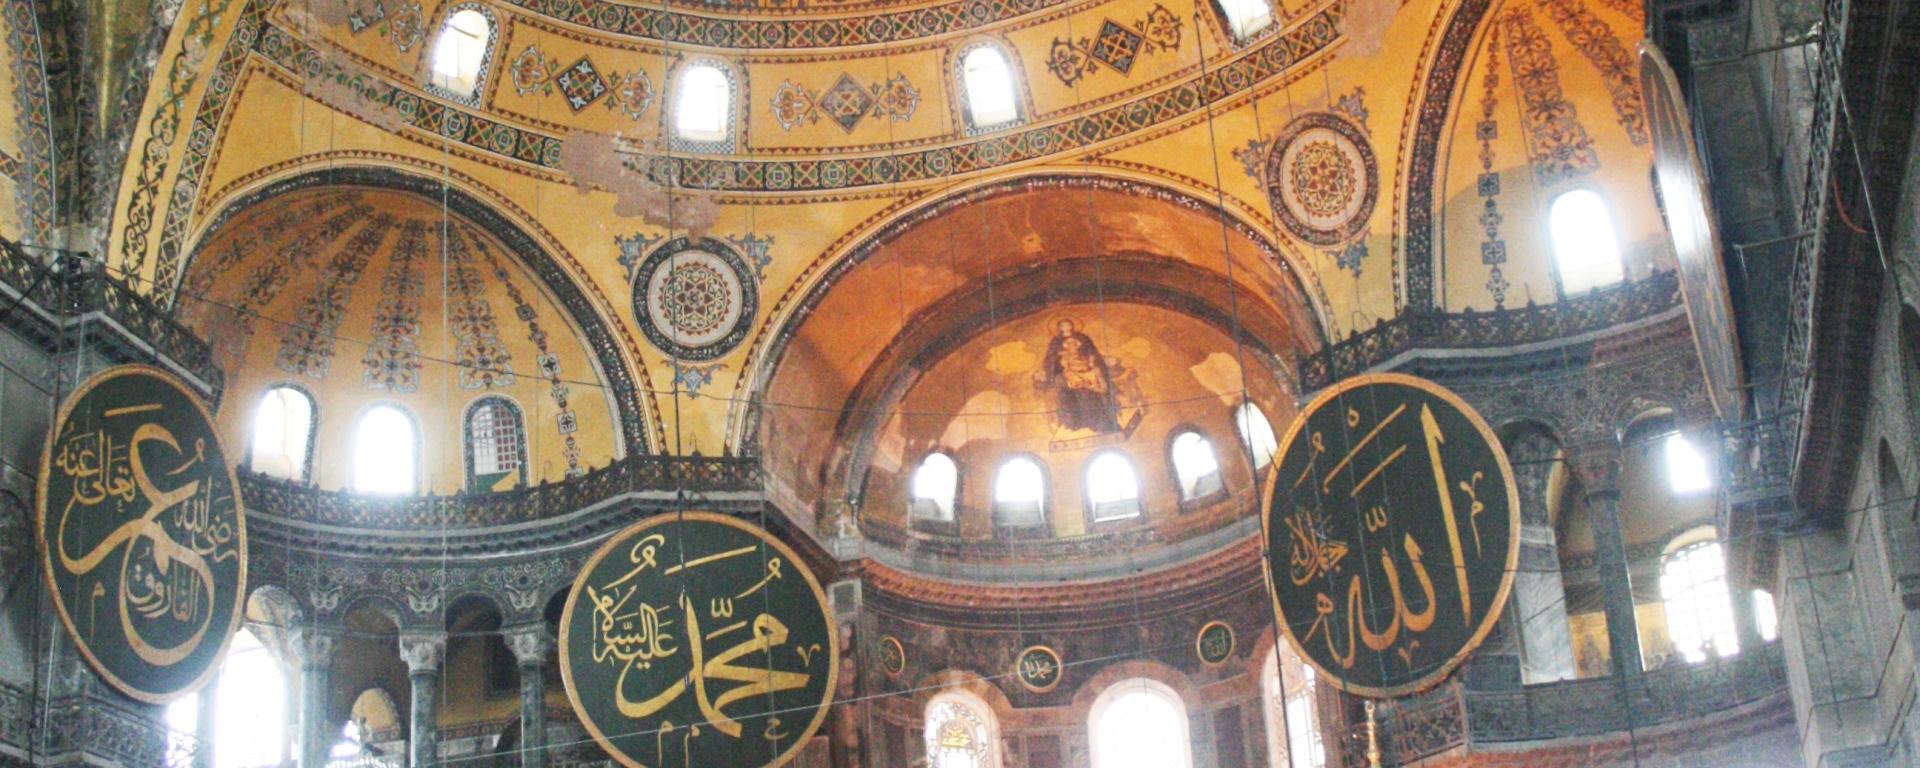 Istanbul photography, Aya Sophia, St Sophia, Hagia Sophia, travel, photos, photography, Turkey